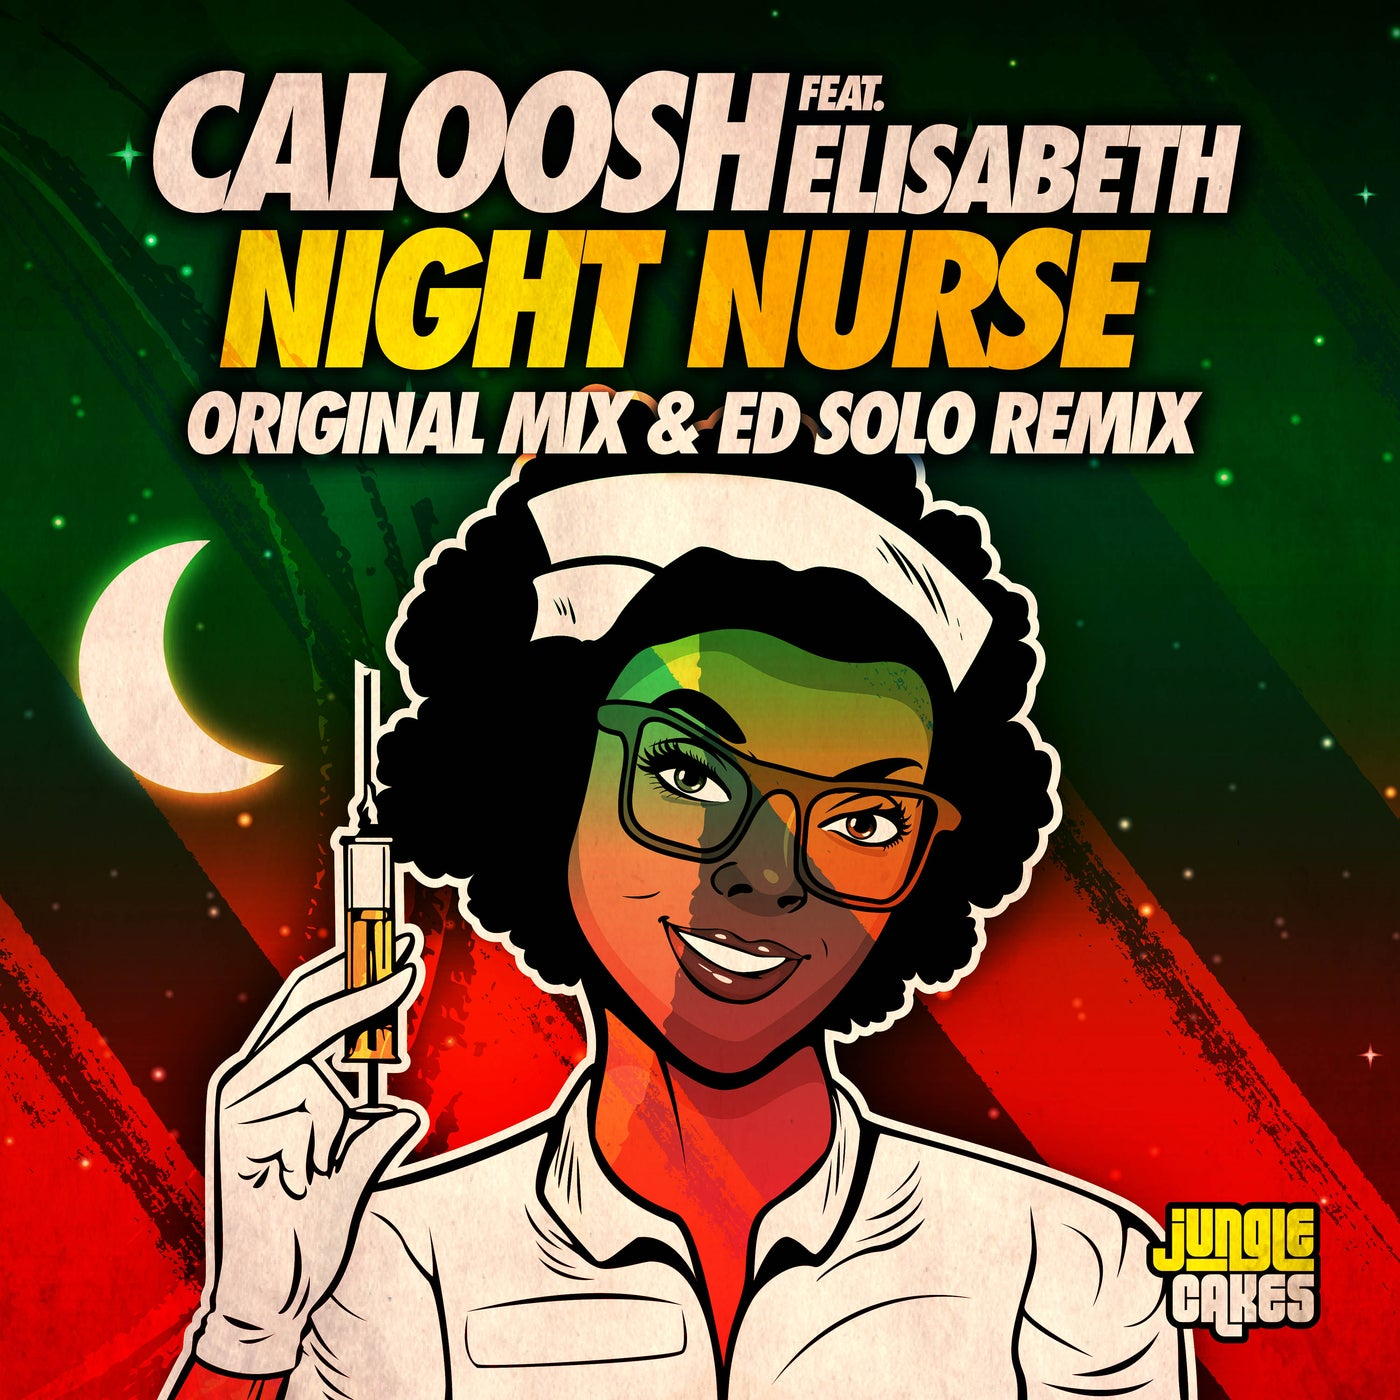 Night Nurse (Ed Solo Remix)